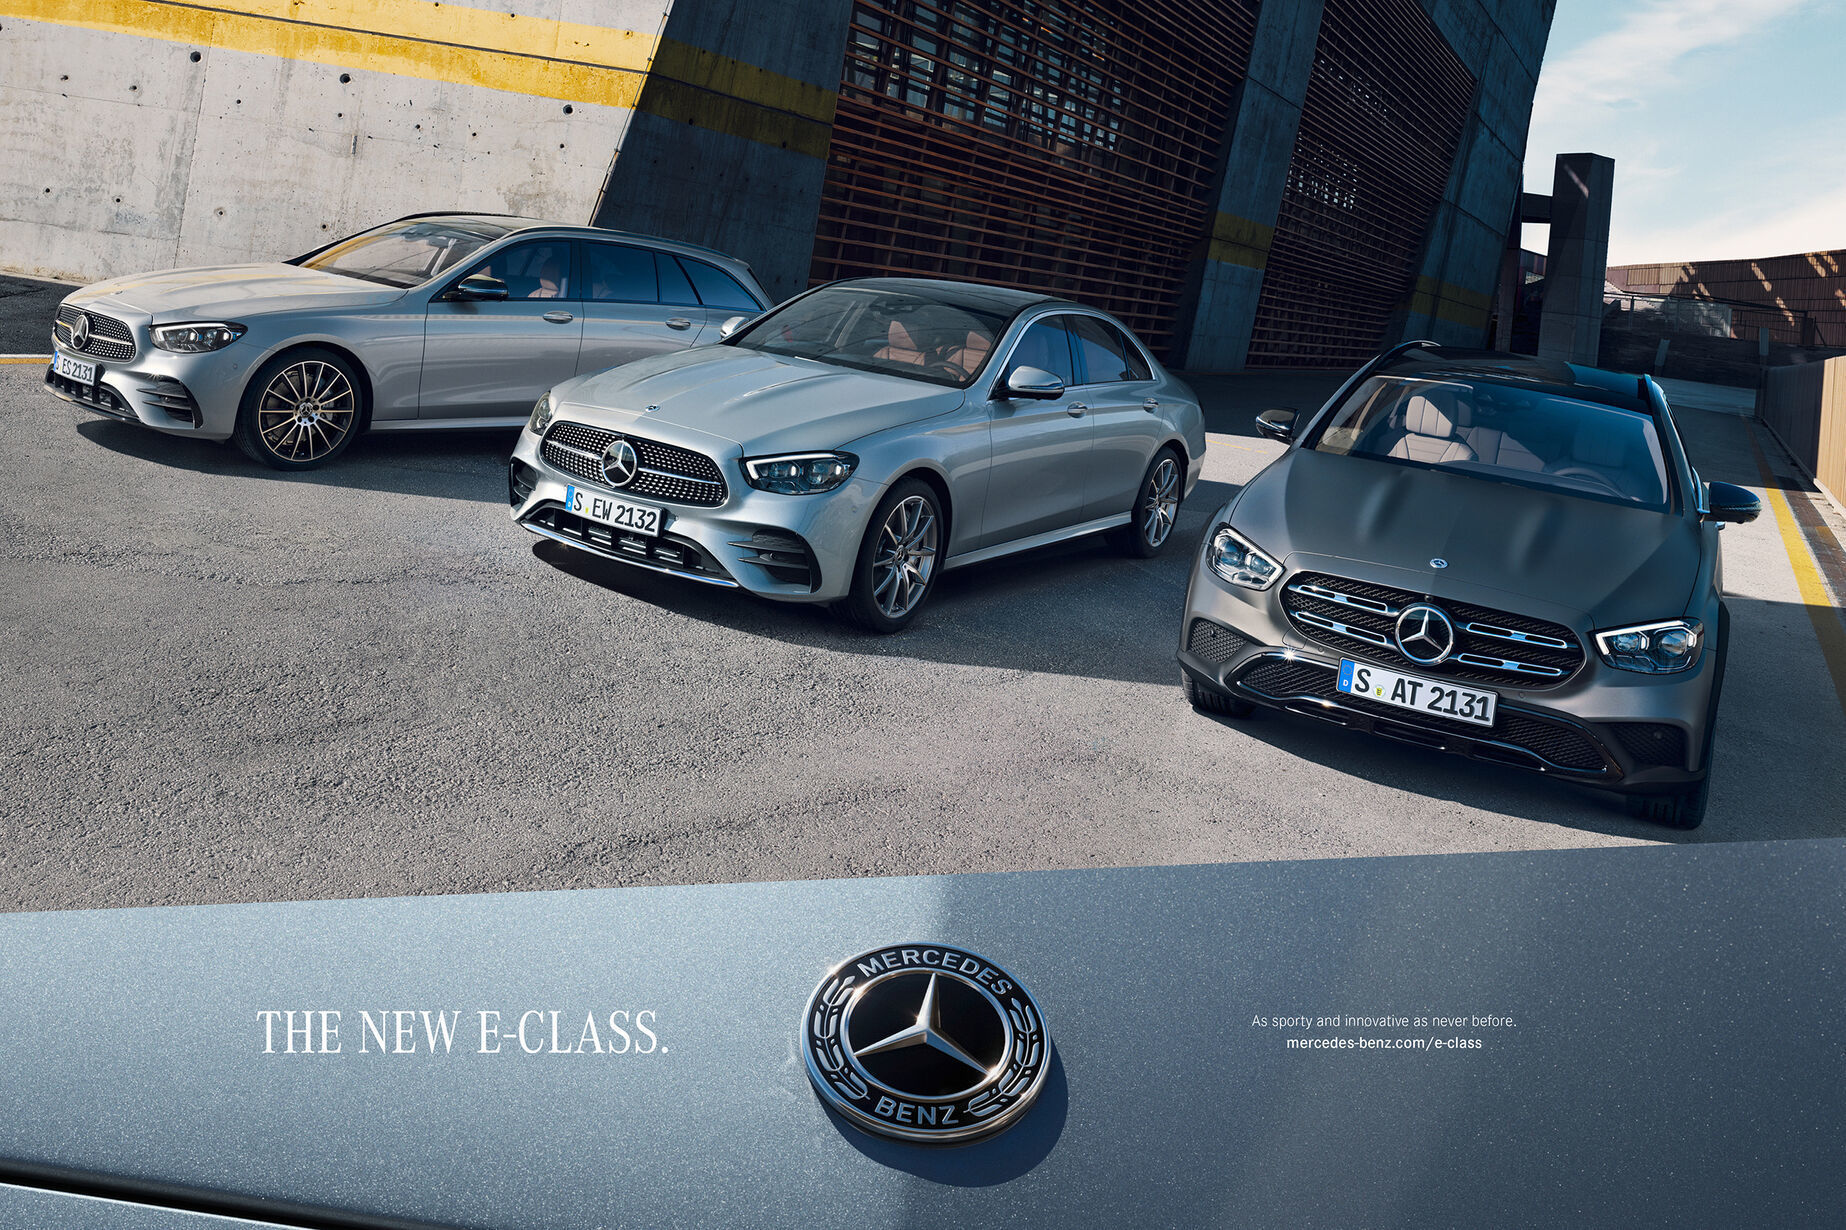 FRITHJOF OHM INCL. PRETZSCH w/ antoni Berlin for Mercedes-Benz